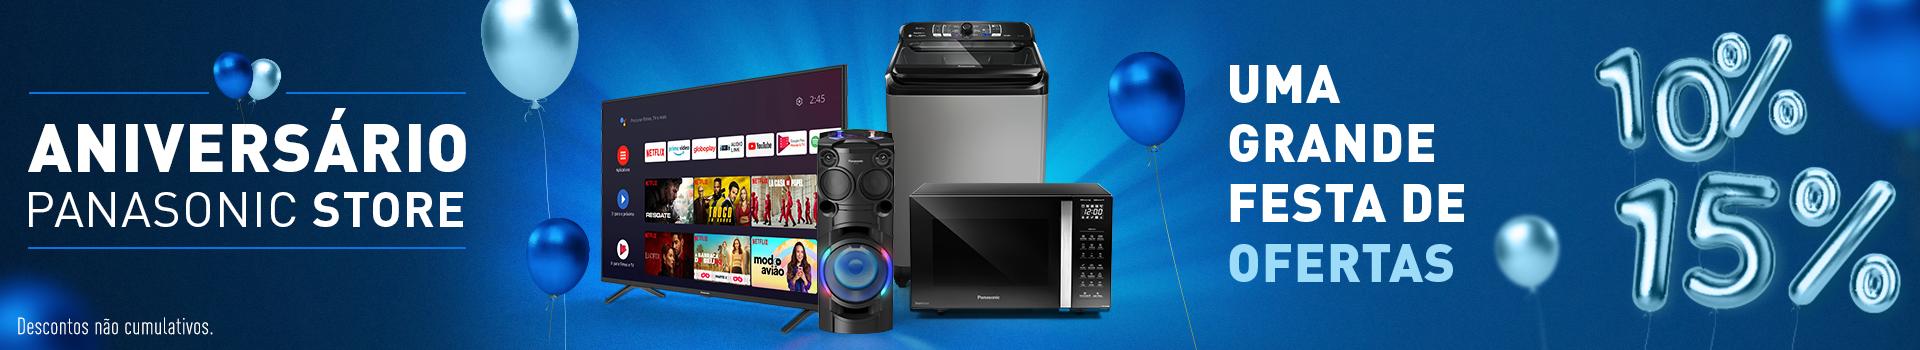 Eletrodomésticos - Panasonic